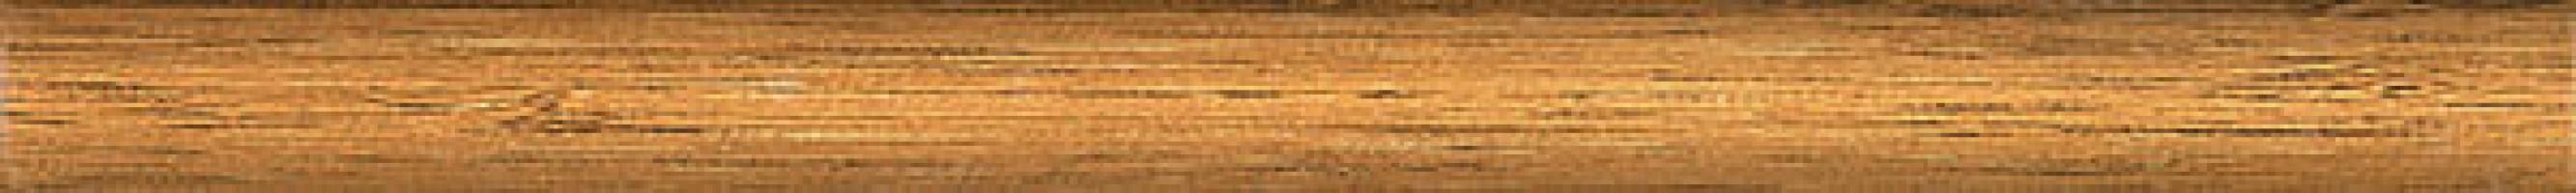 Бордюр 116 Карандаш Дерево бежевый матовый 25х2 Kerama Marazzi